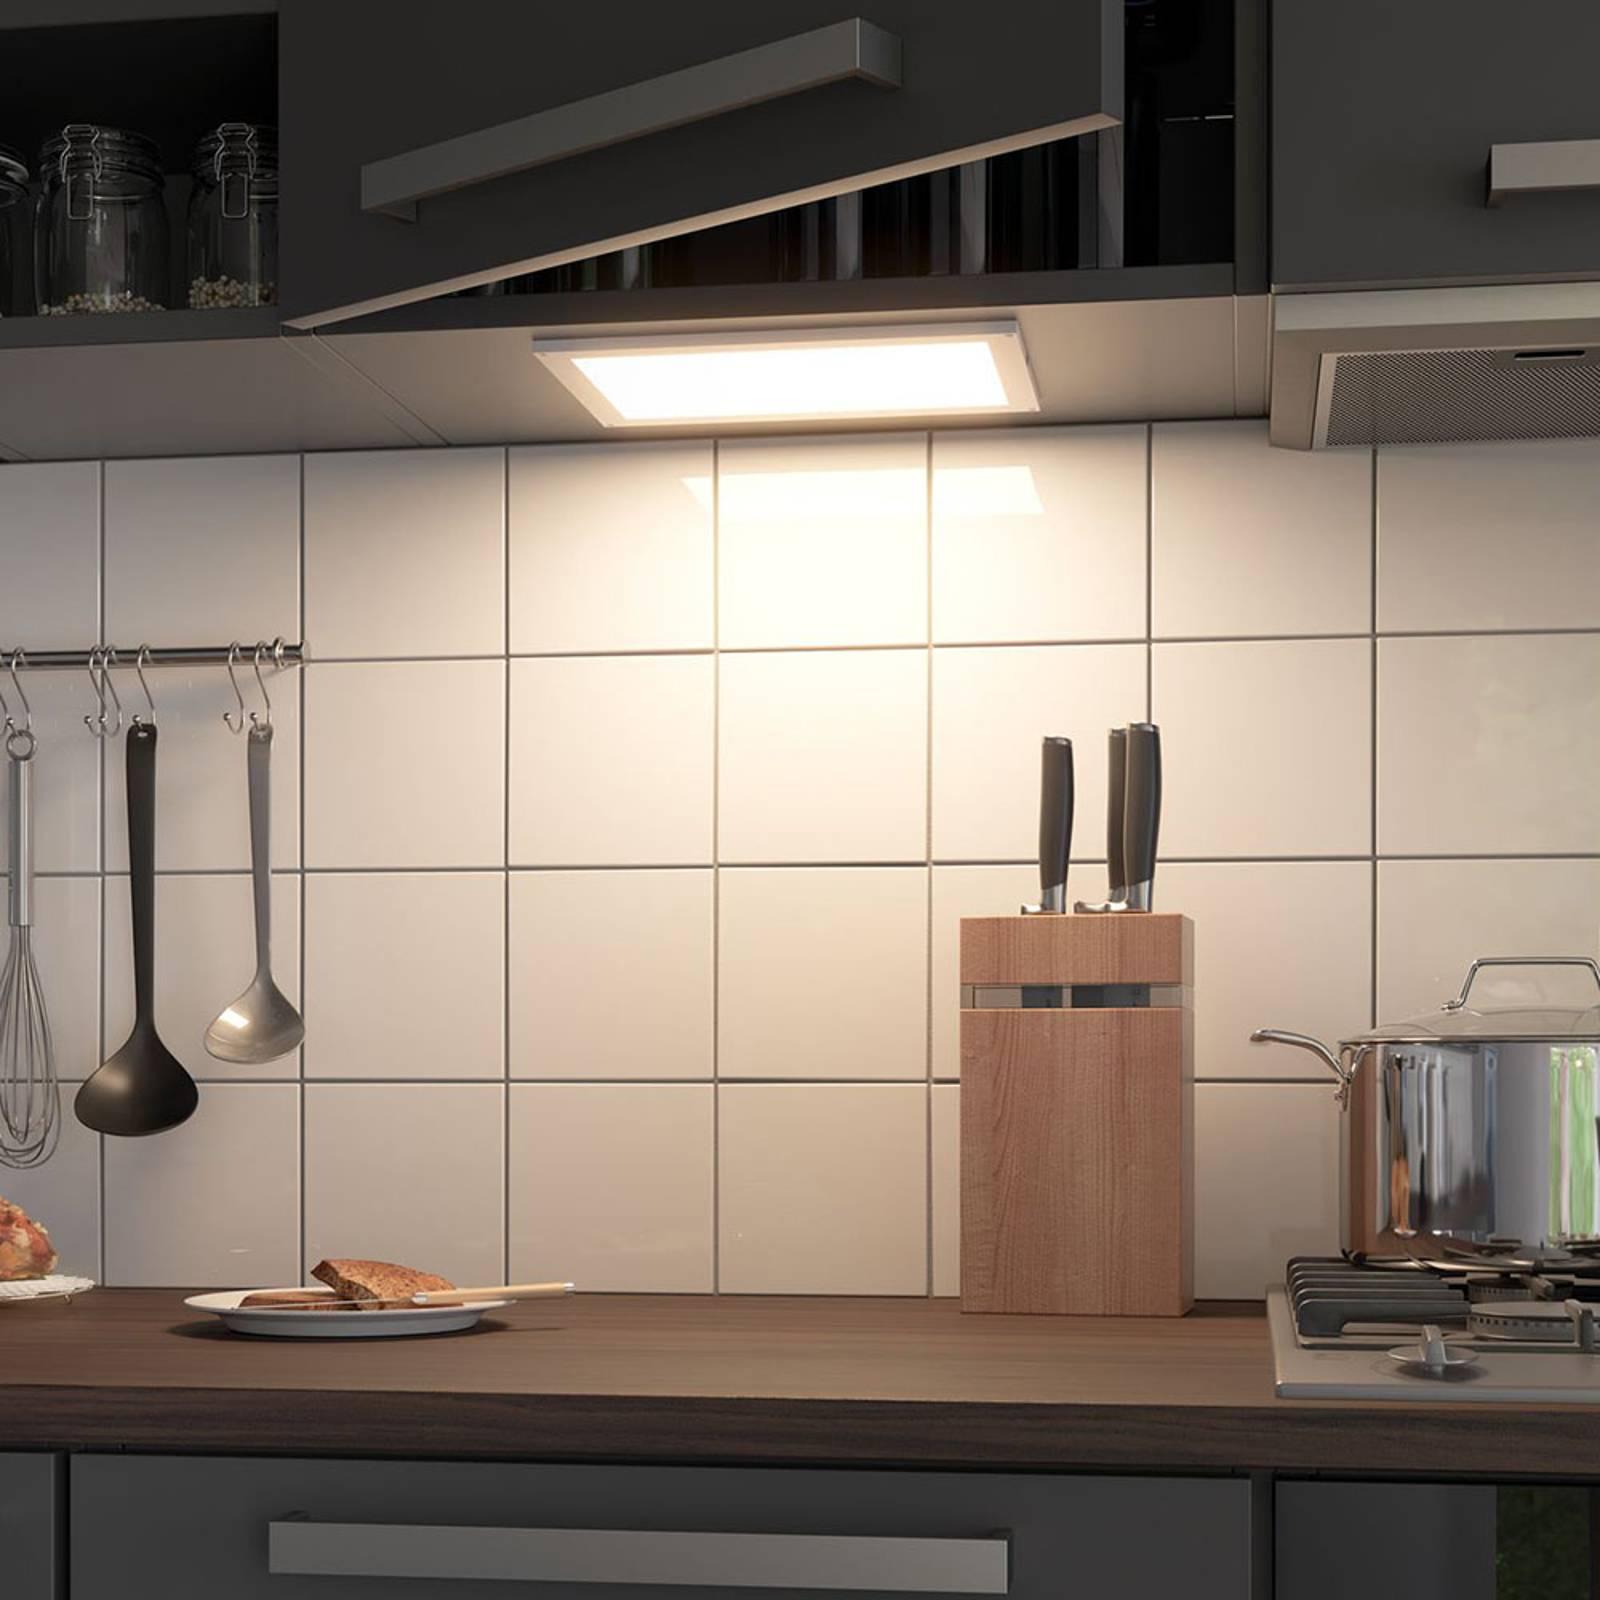 Paulmann Světlo pod kuchyňskou linku